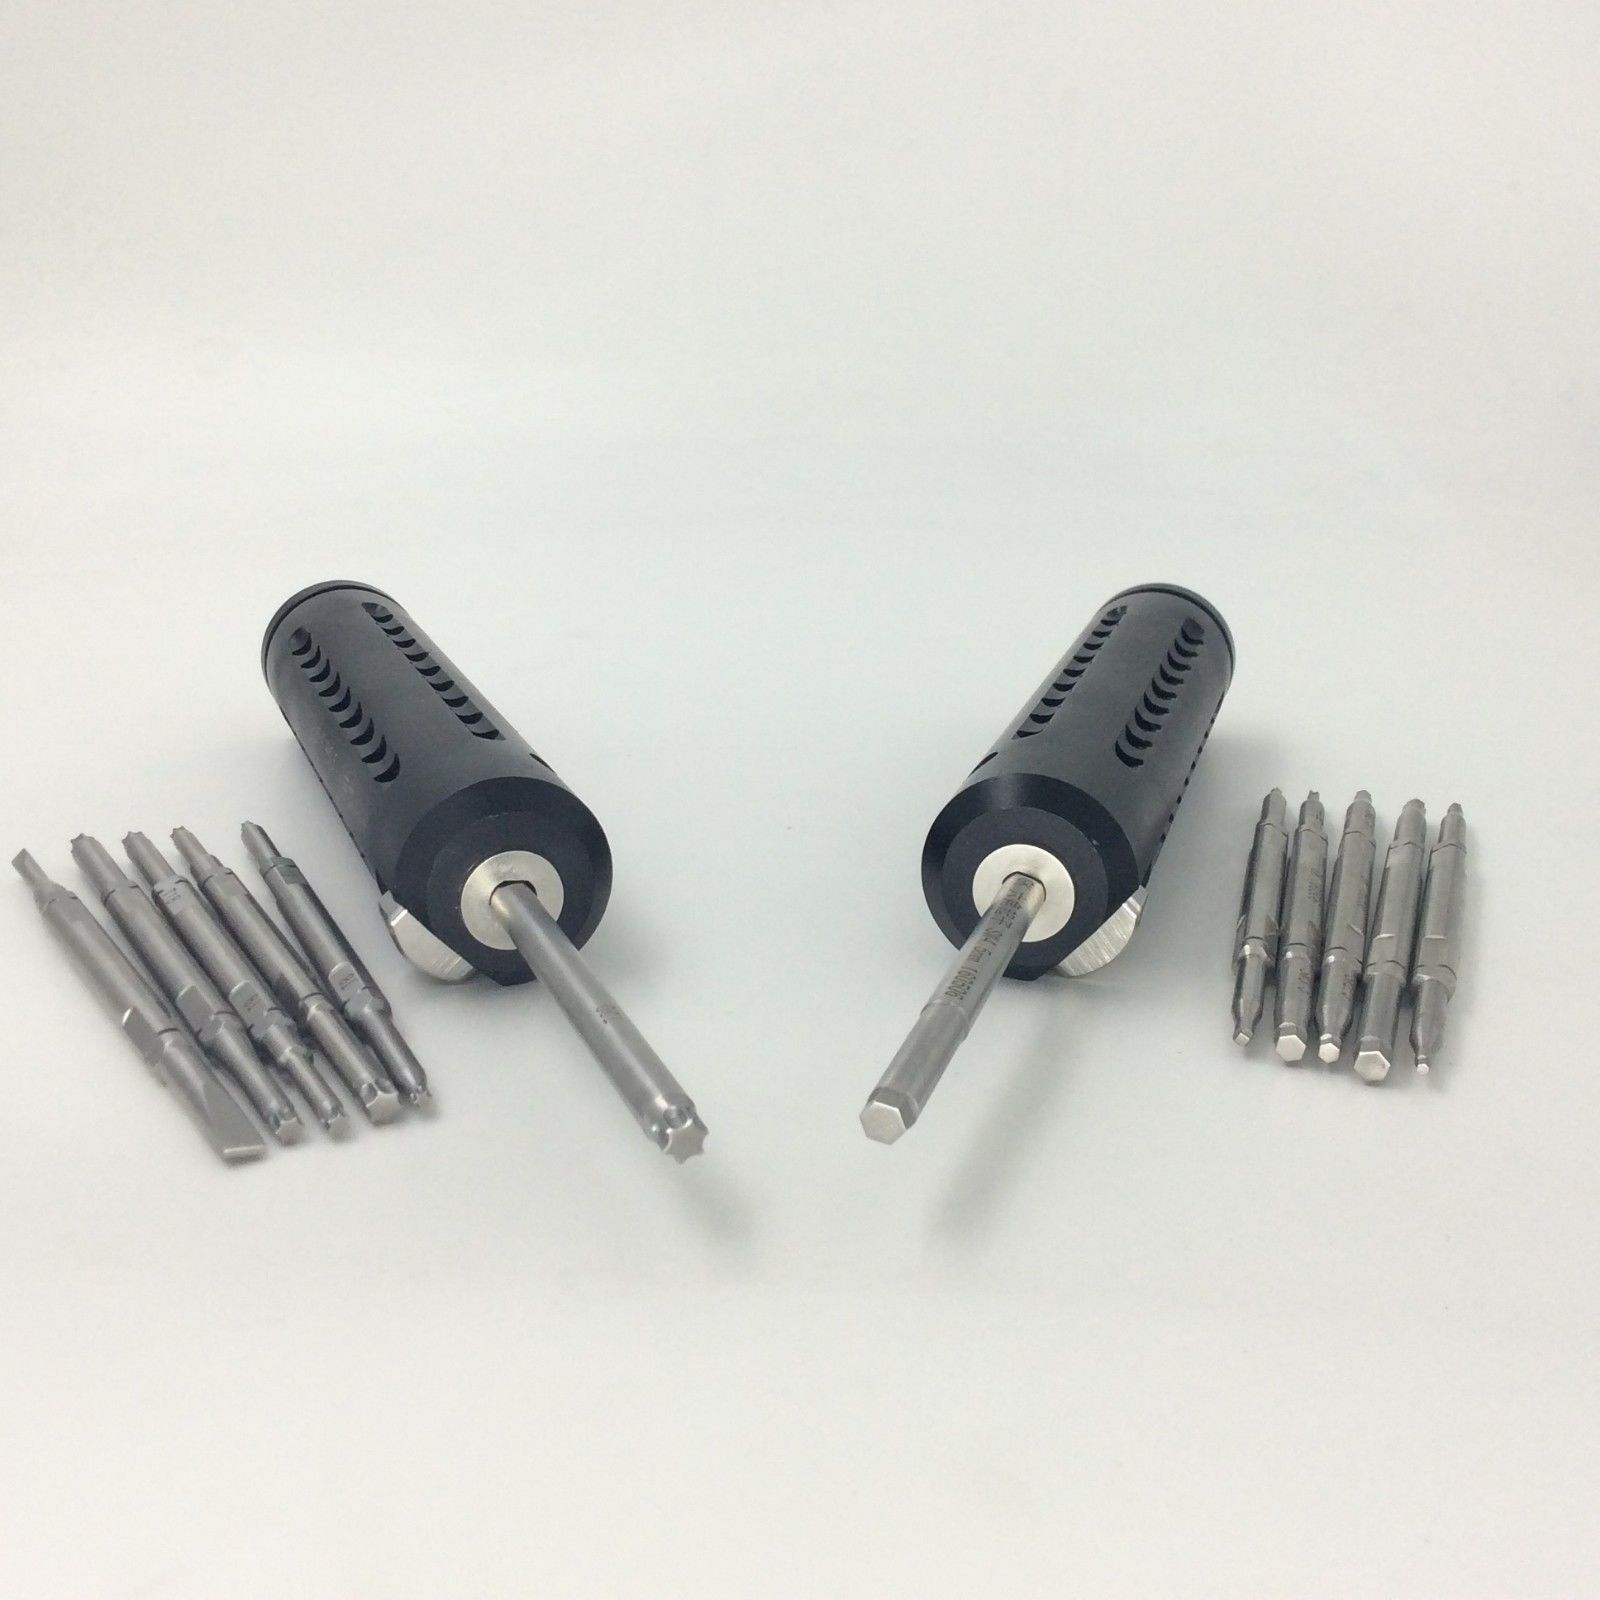 2 Bone Screwdriver Sets Quick Coupling Handle Veterinary Orthopedic Instrument